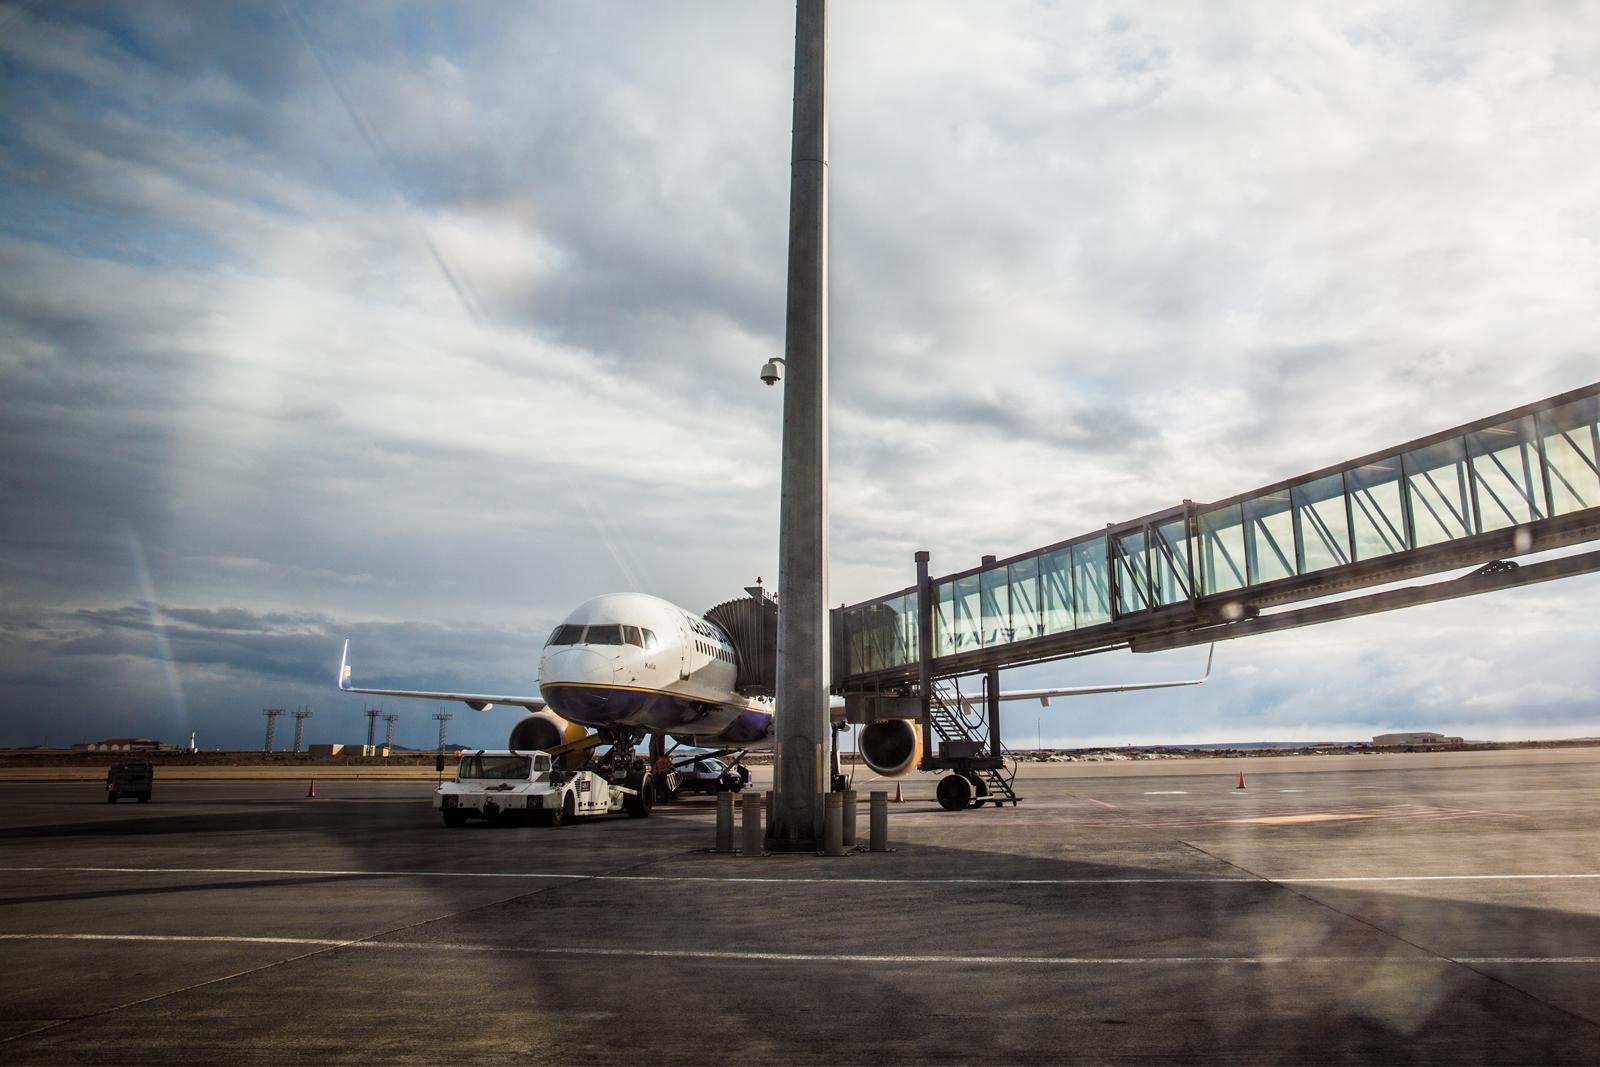 bolfo_0012s_0002_Icelandair @ Iceland